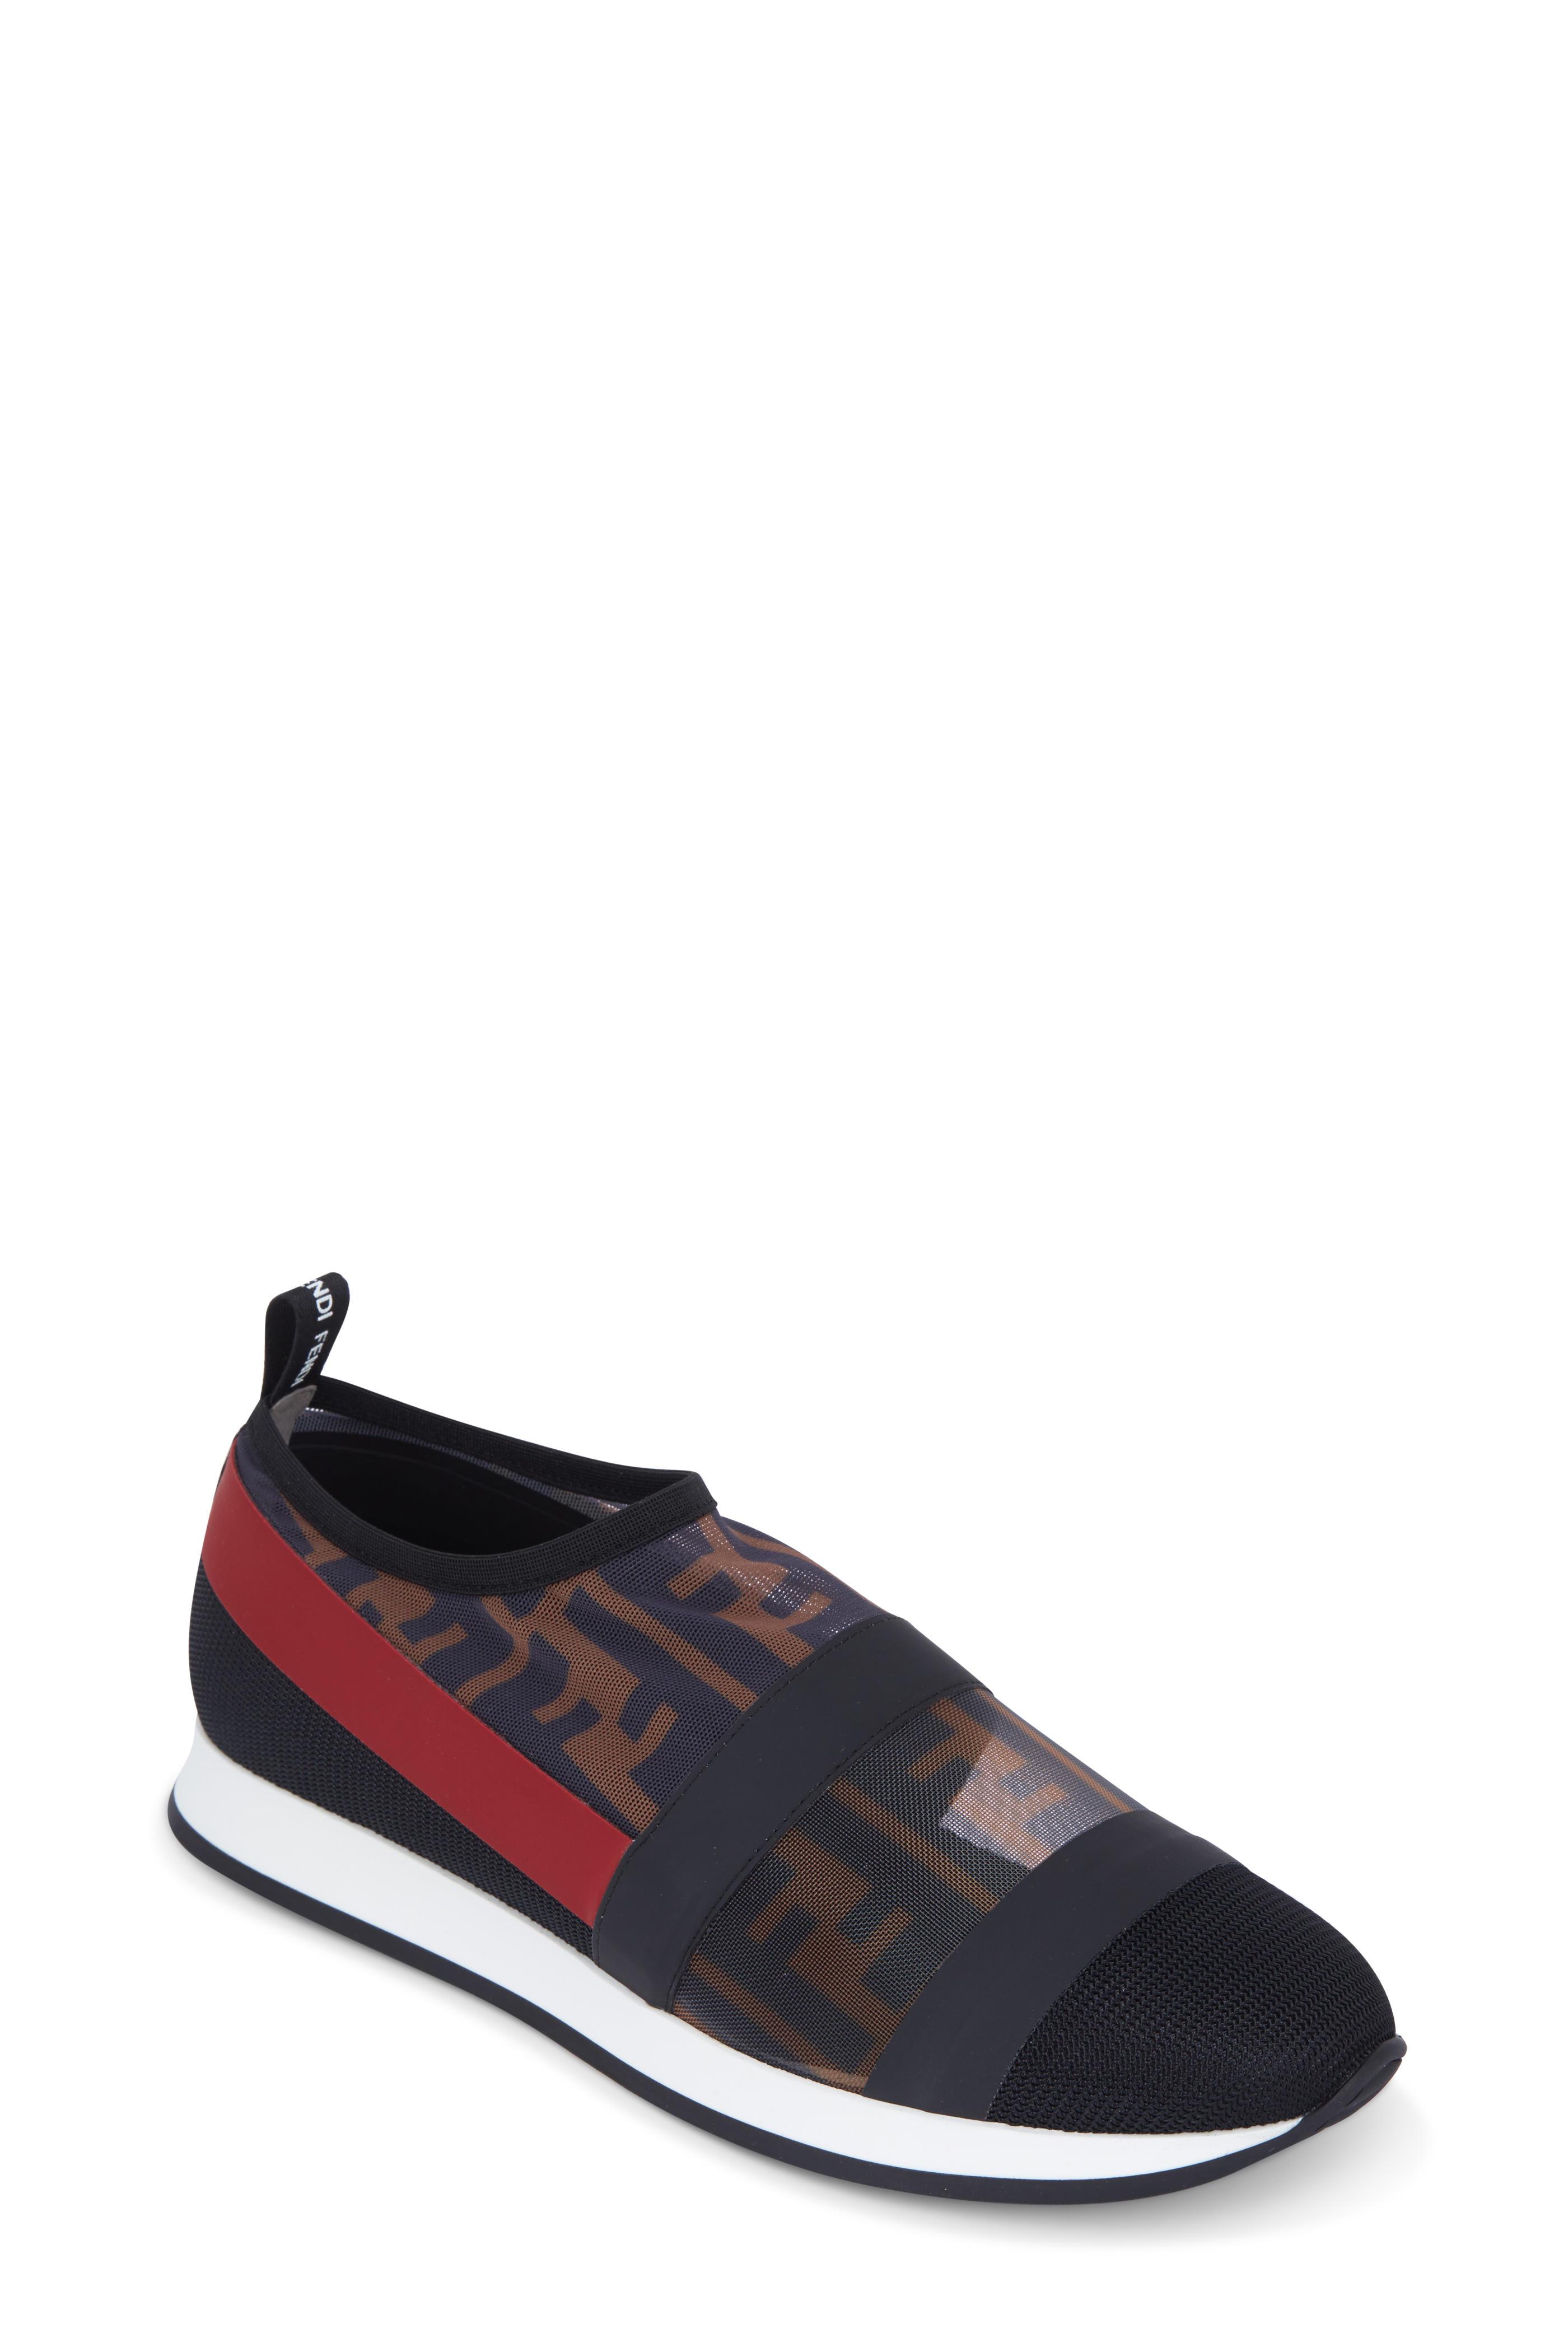 4e92d1a889 Fendi - Black Zucca Mesh Sneaker   Mitchell Stores